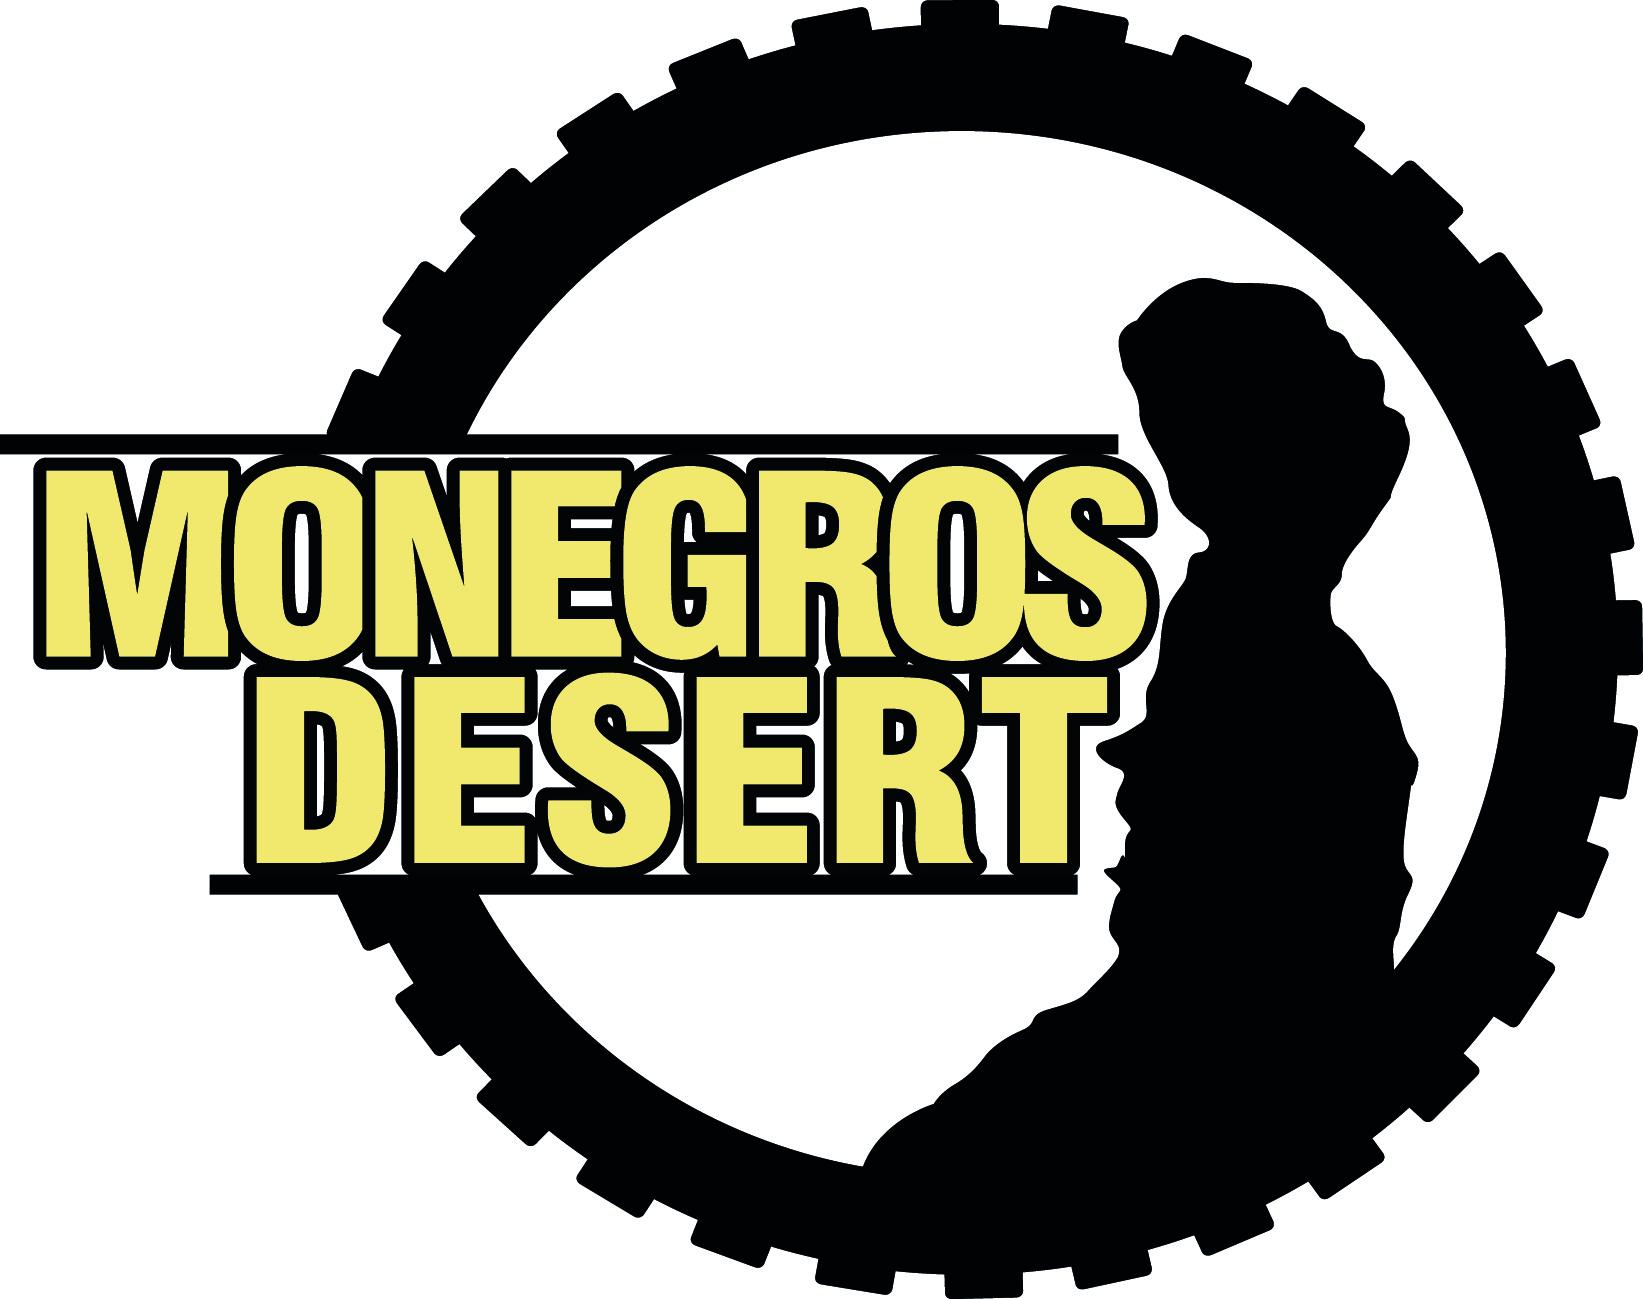 ||| Monegros Desert